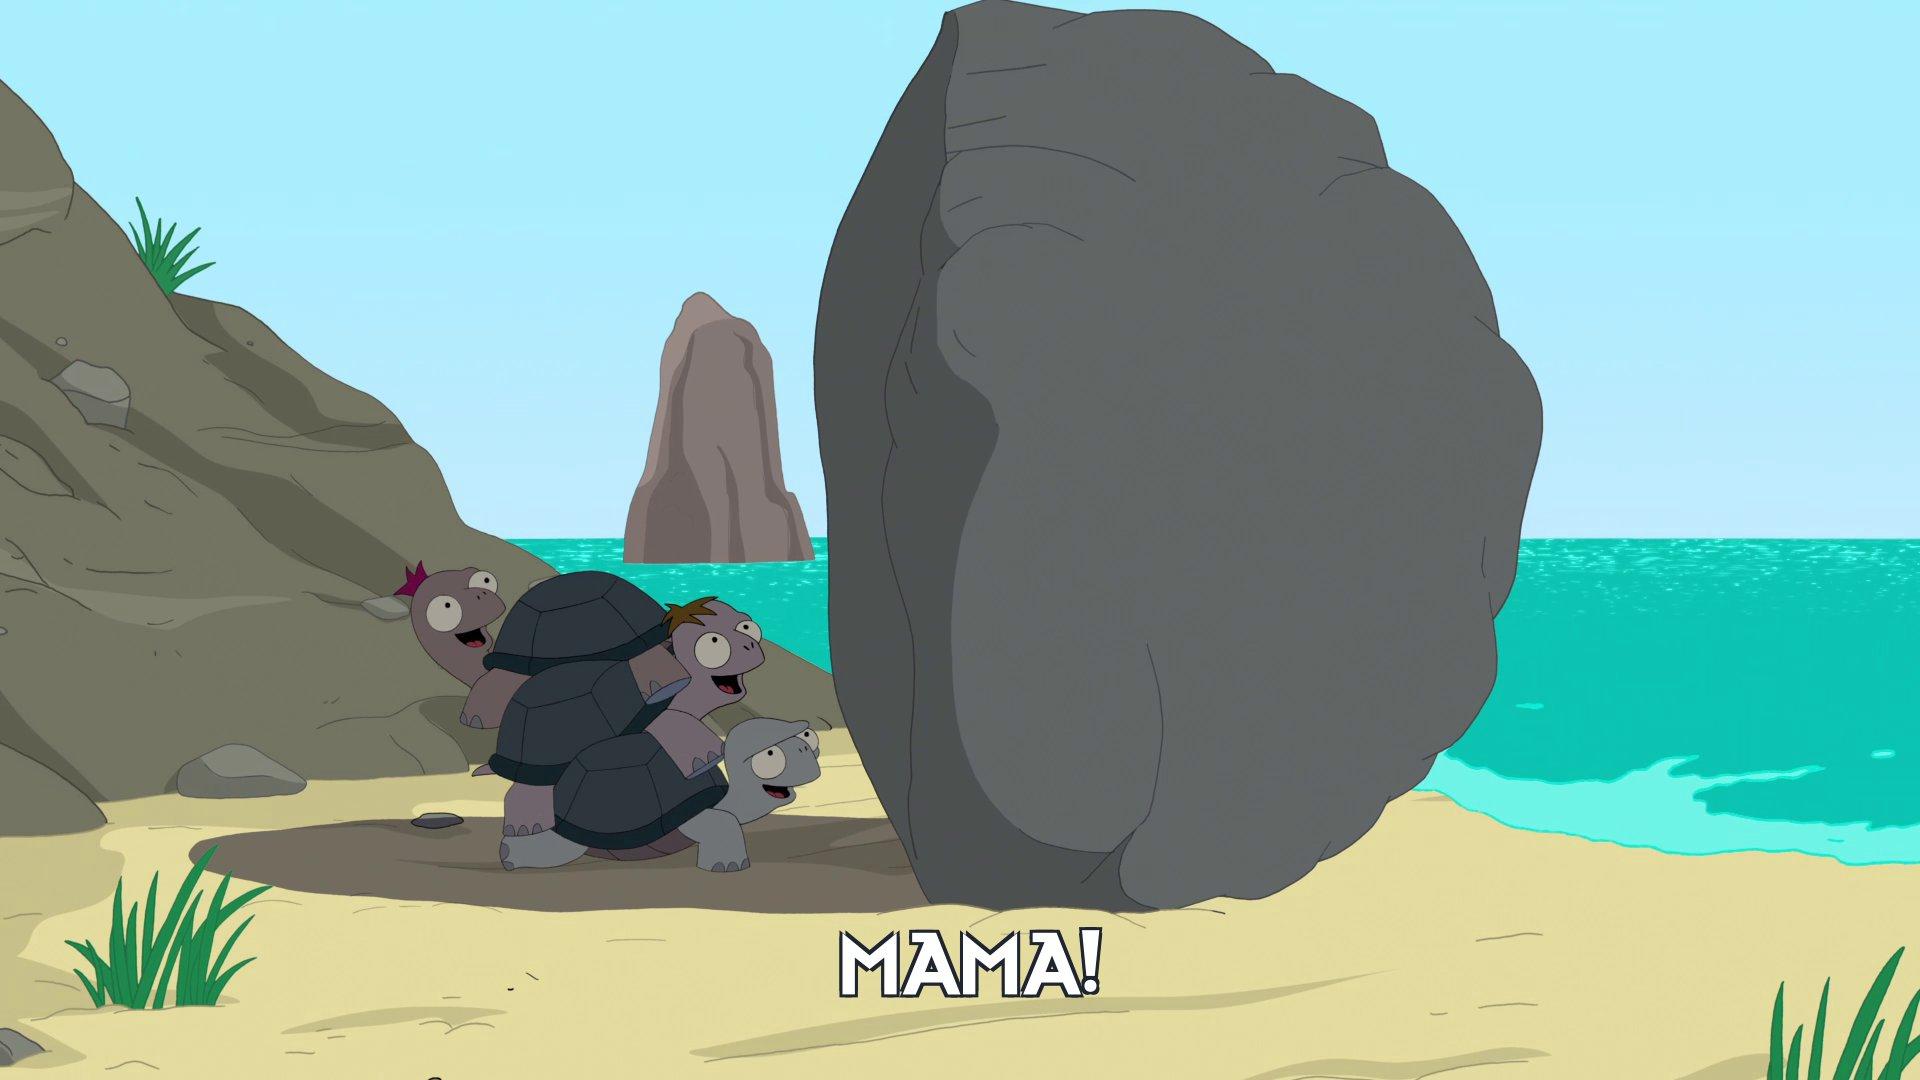 Tortoises: Mama!